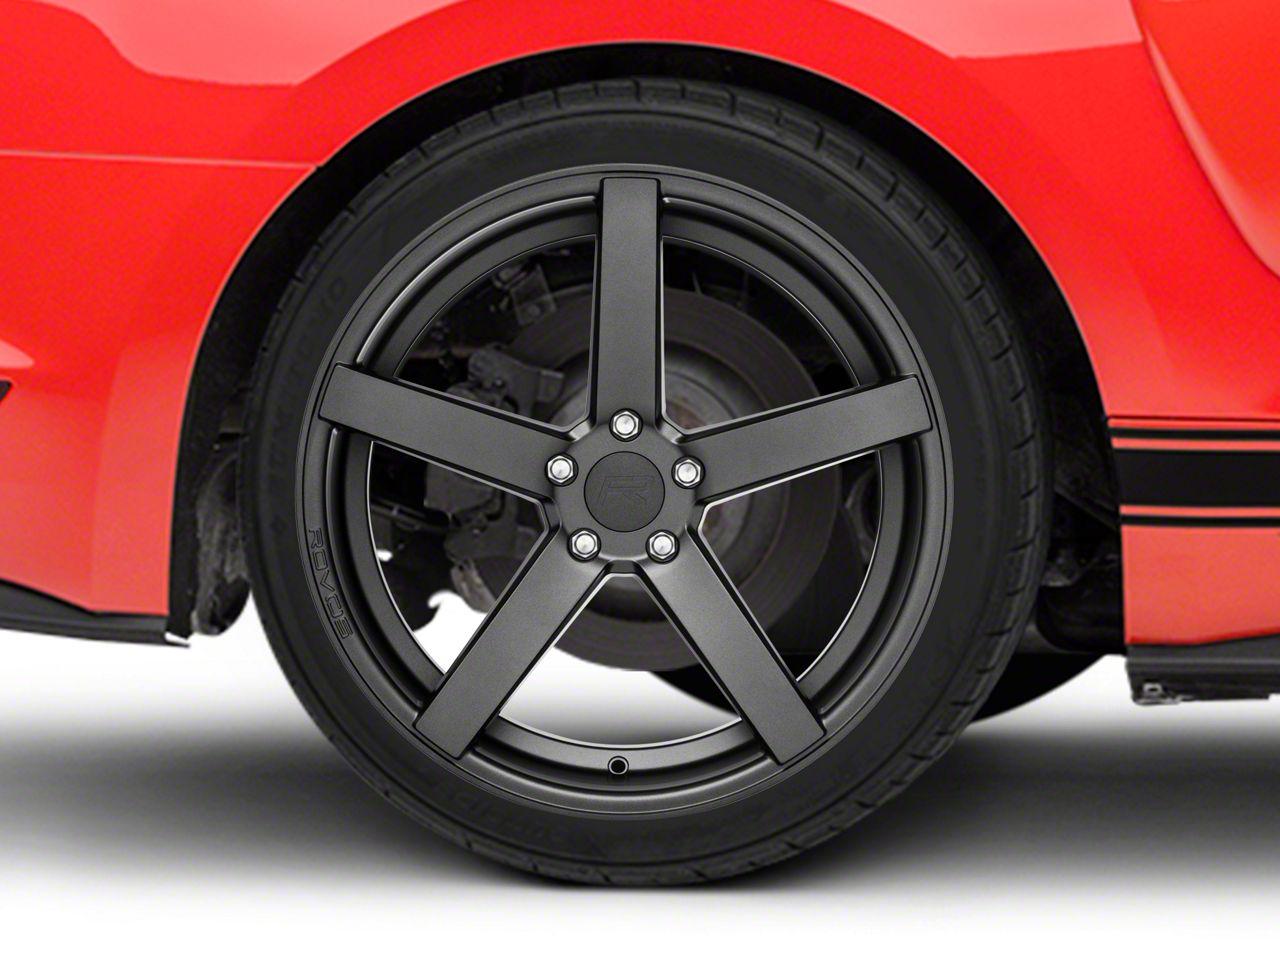 Rovos Durban Satin Gunmetal Wheel - 20x10 - Rear Only (15-19 GT, EcoBoost, V6)